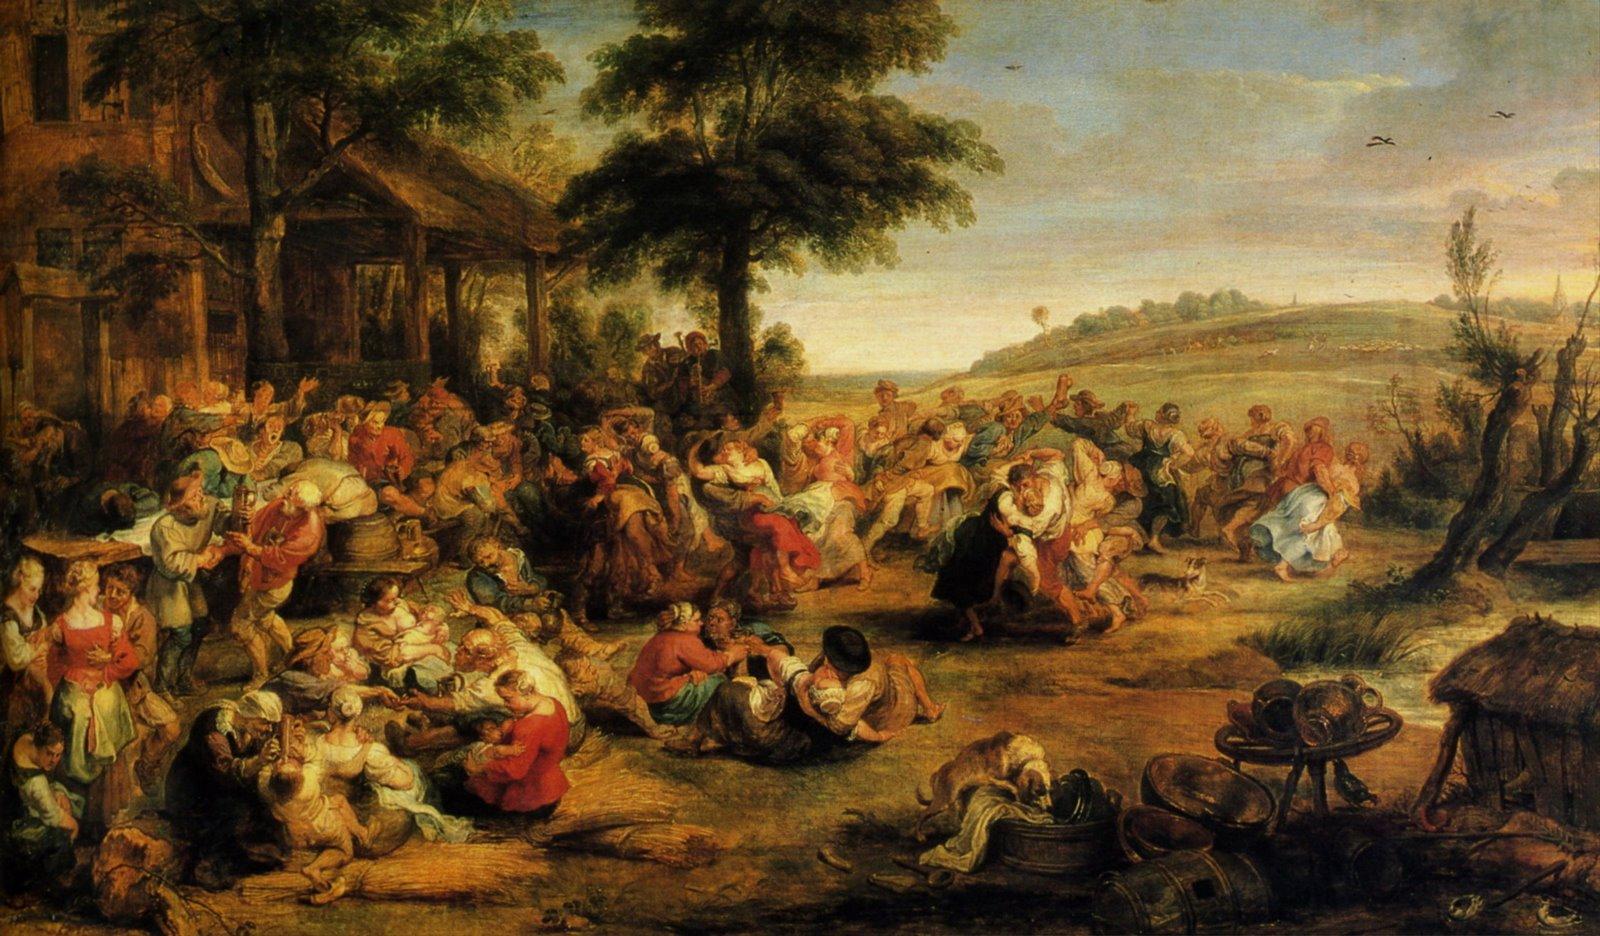 La Kermesse (Rubens,1630-1635)